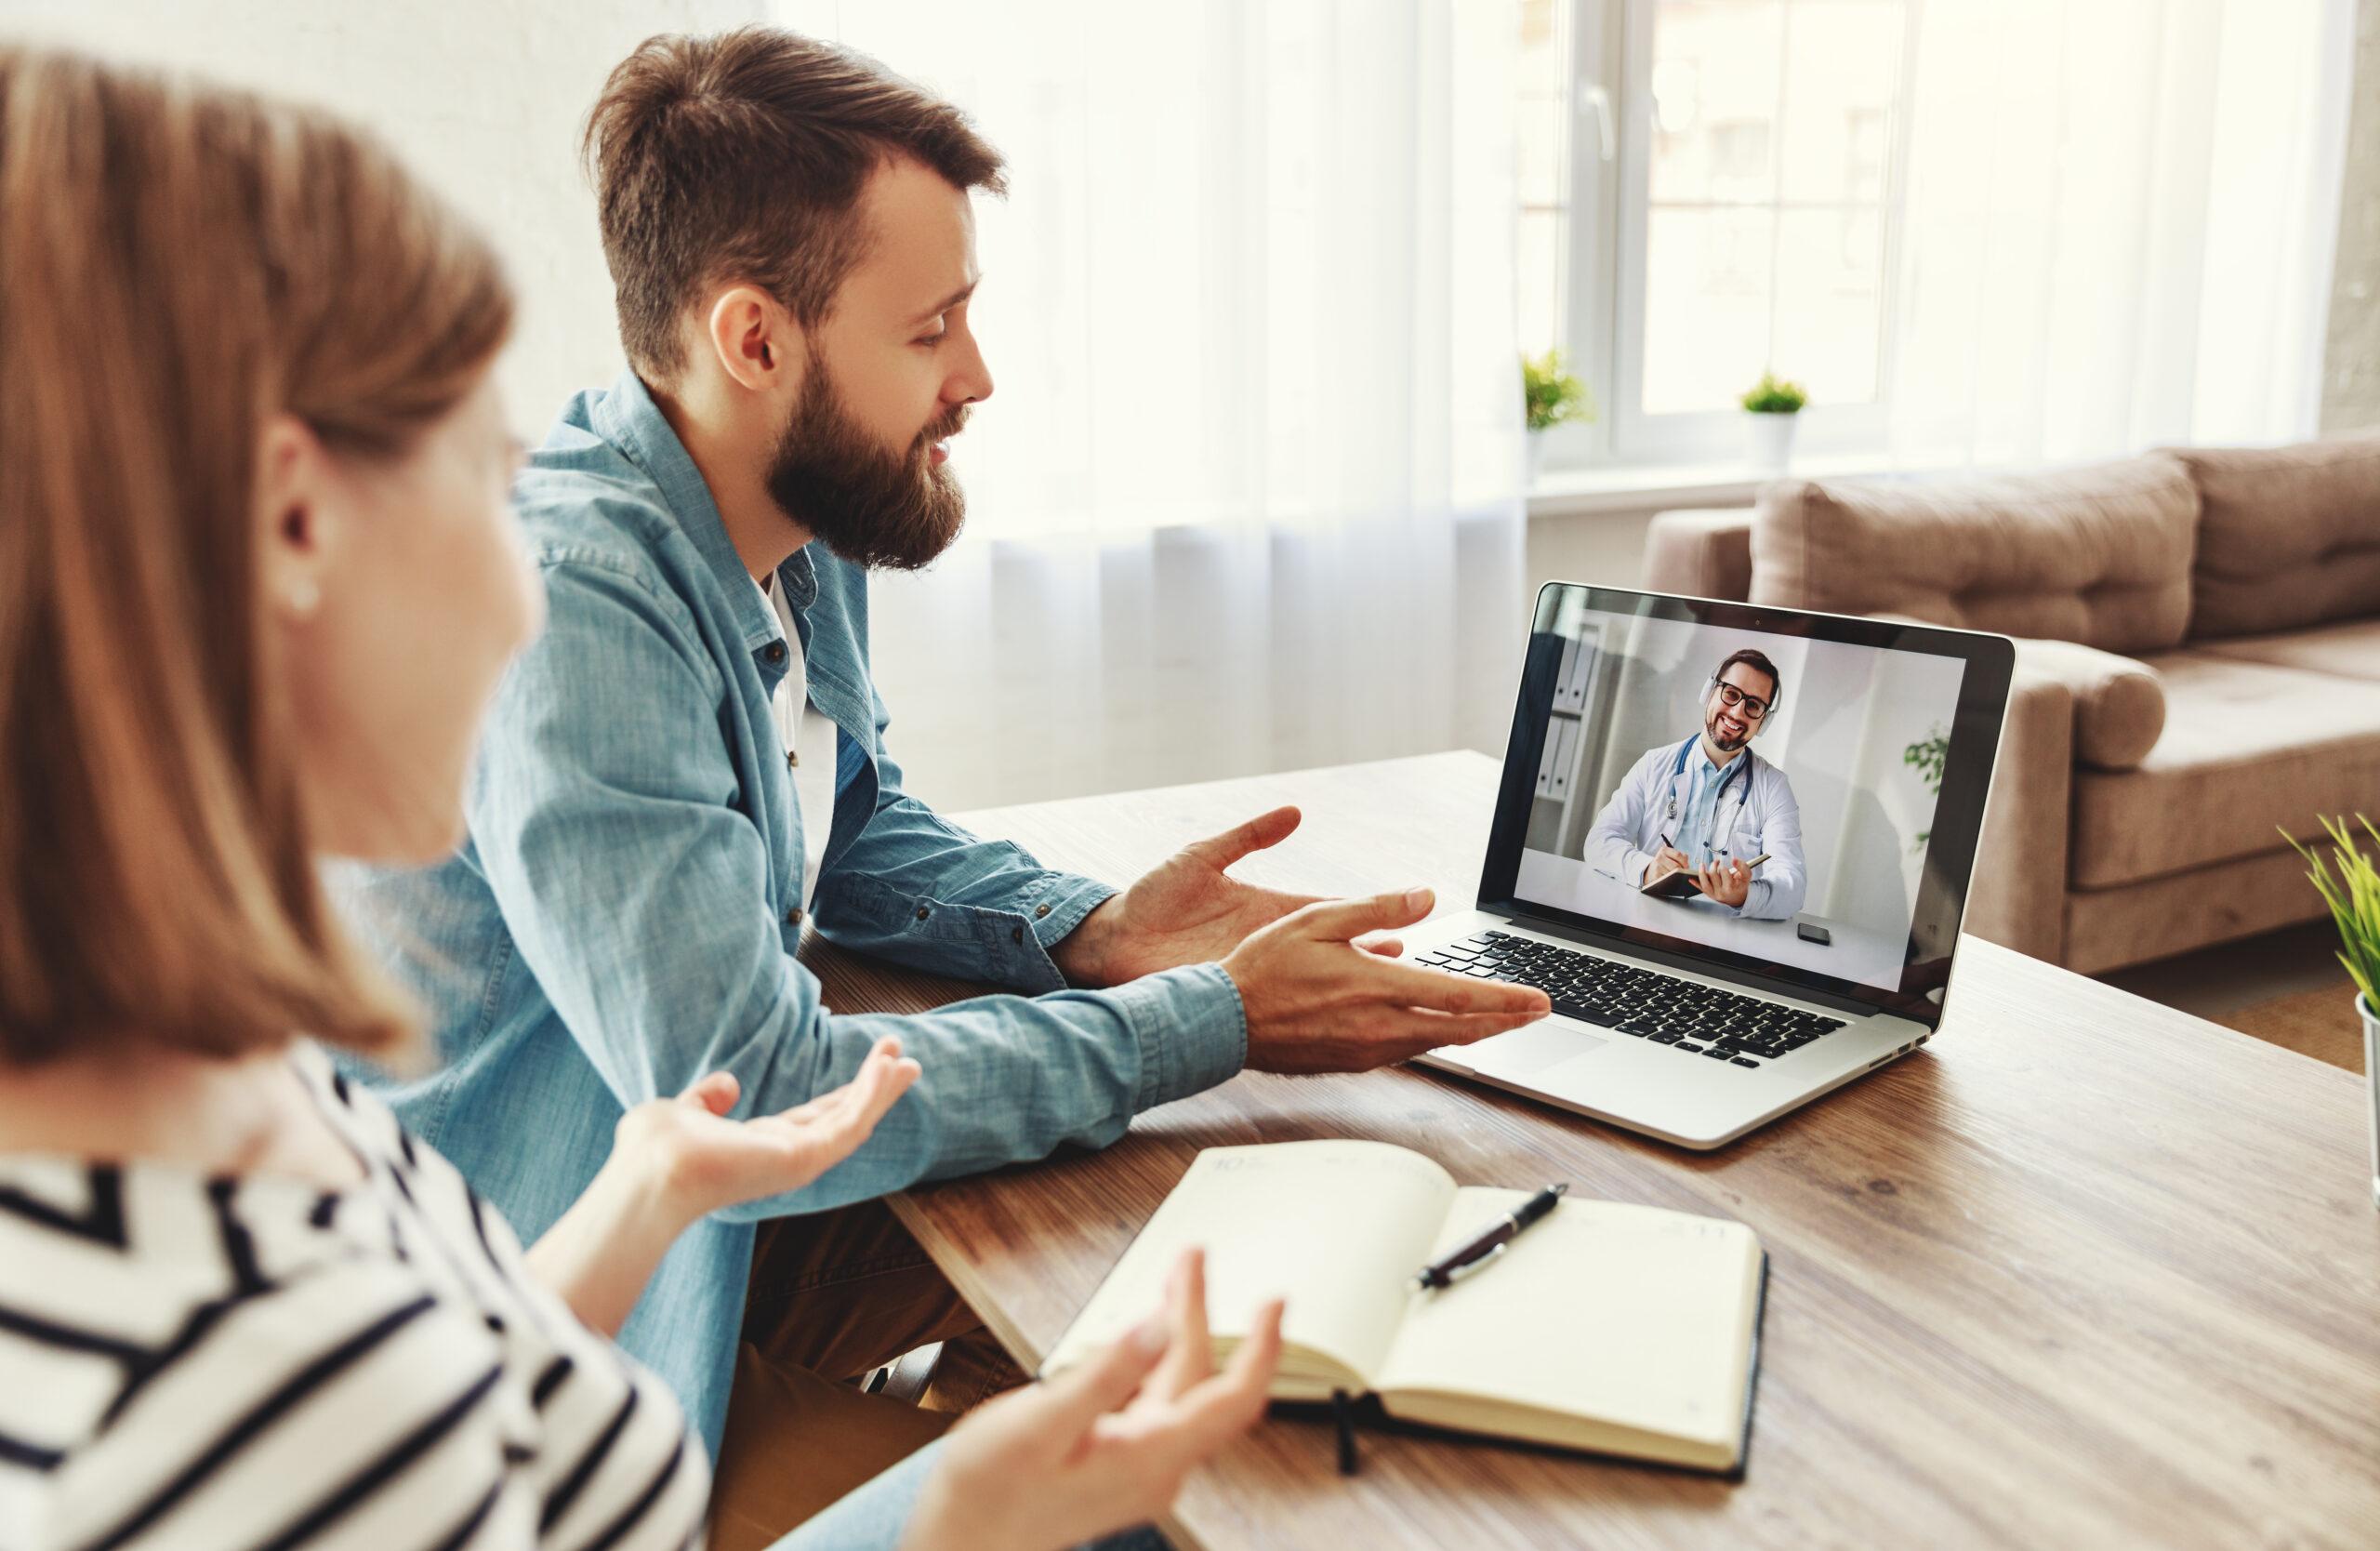 medical treatments through telehealth service